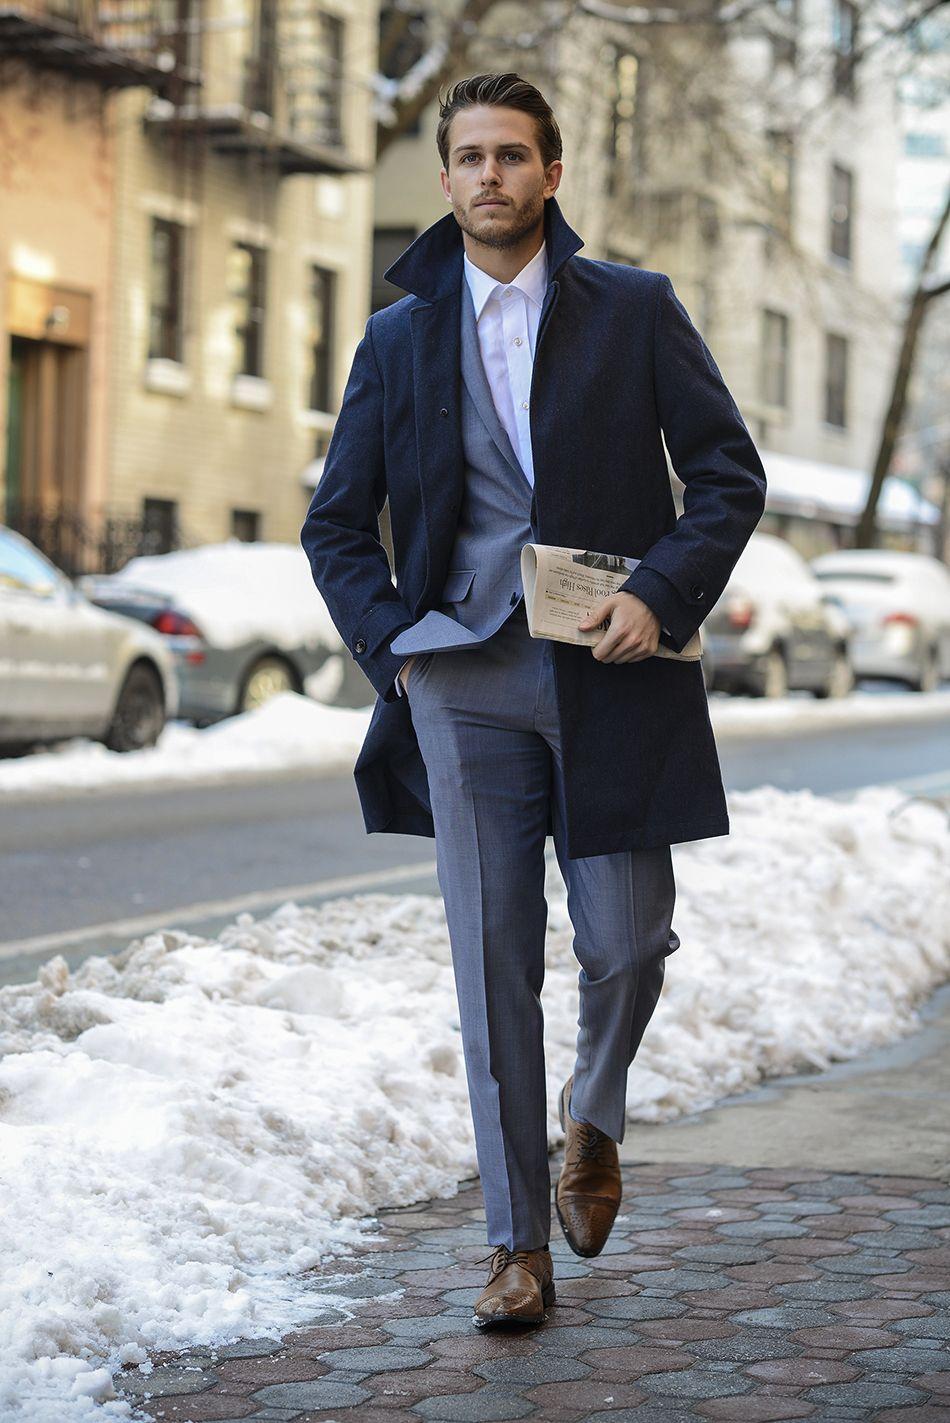 Men's Navy Overcoat, Grey Suit, White Dress Shirt, Brown Leather ...